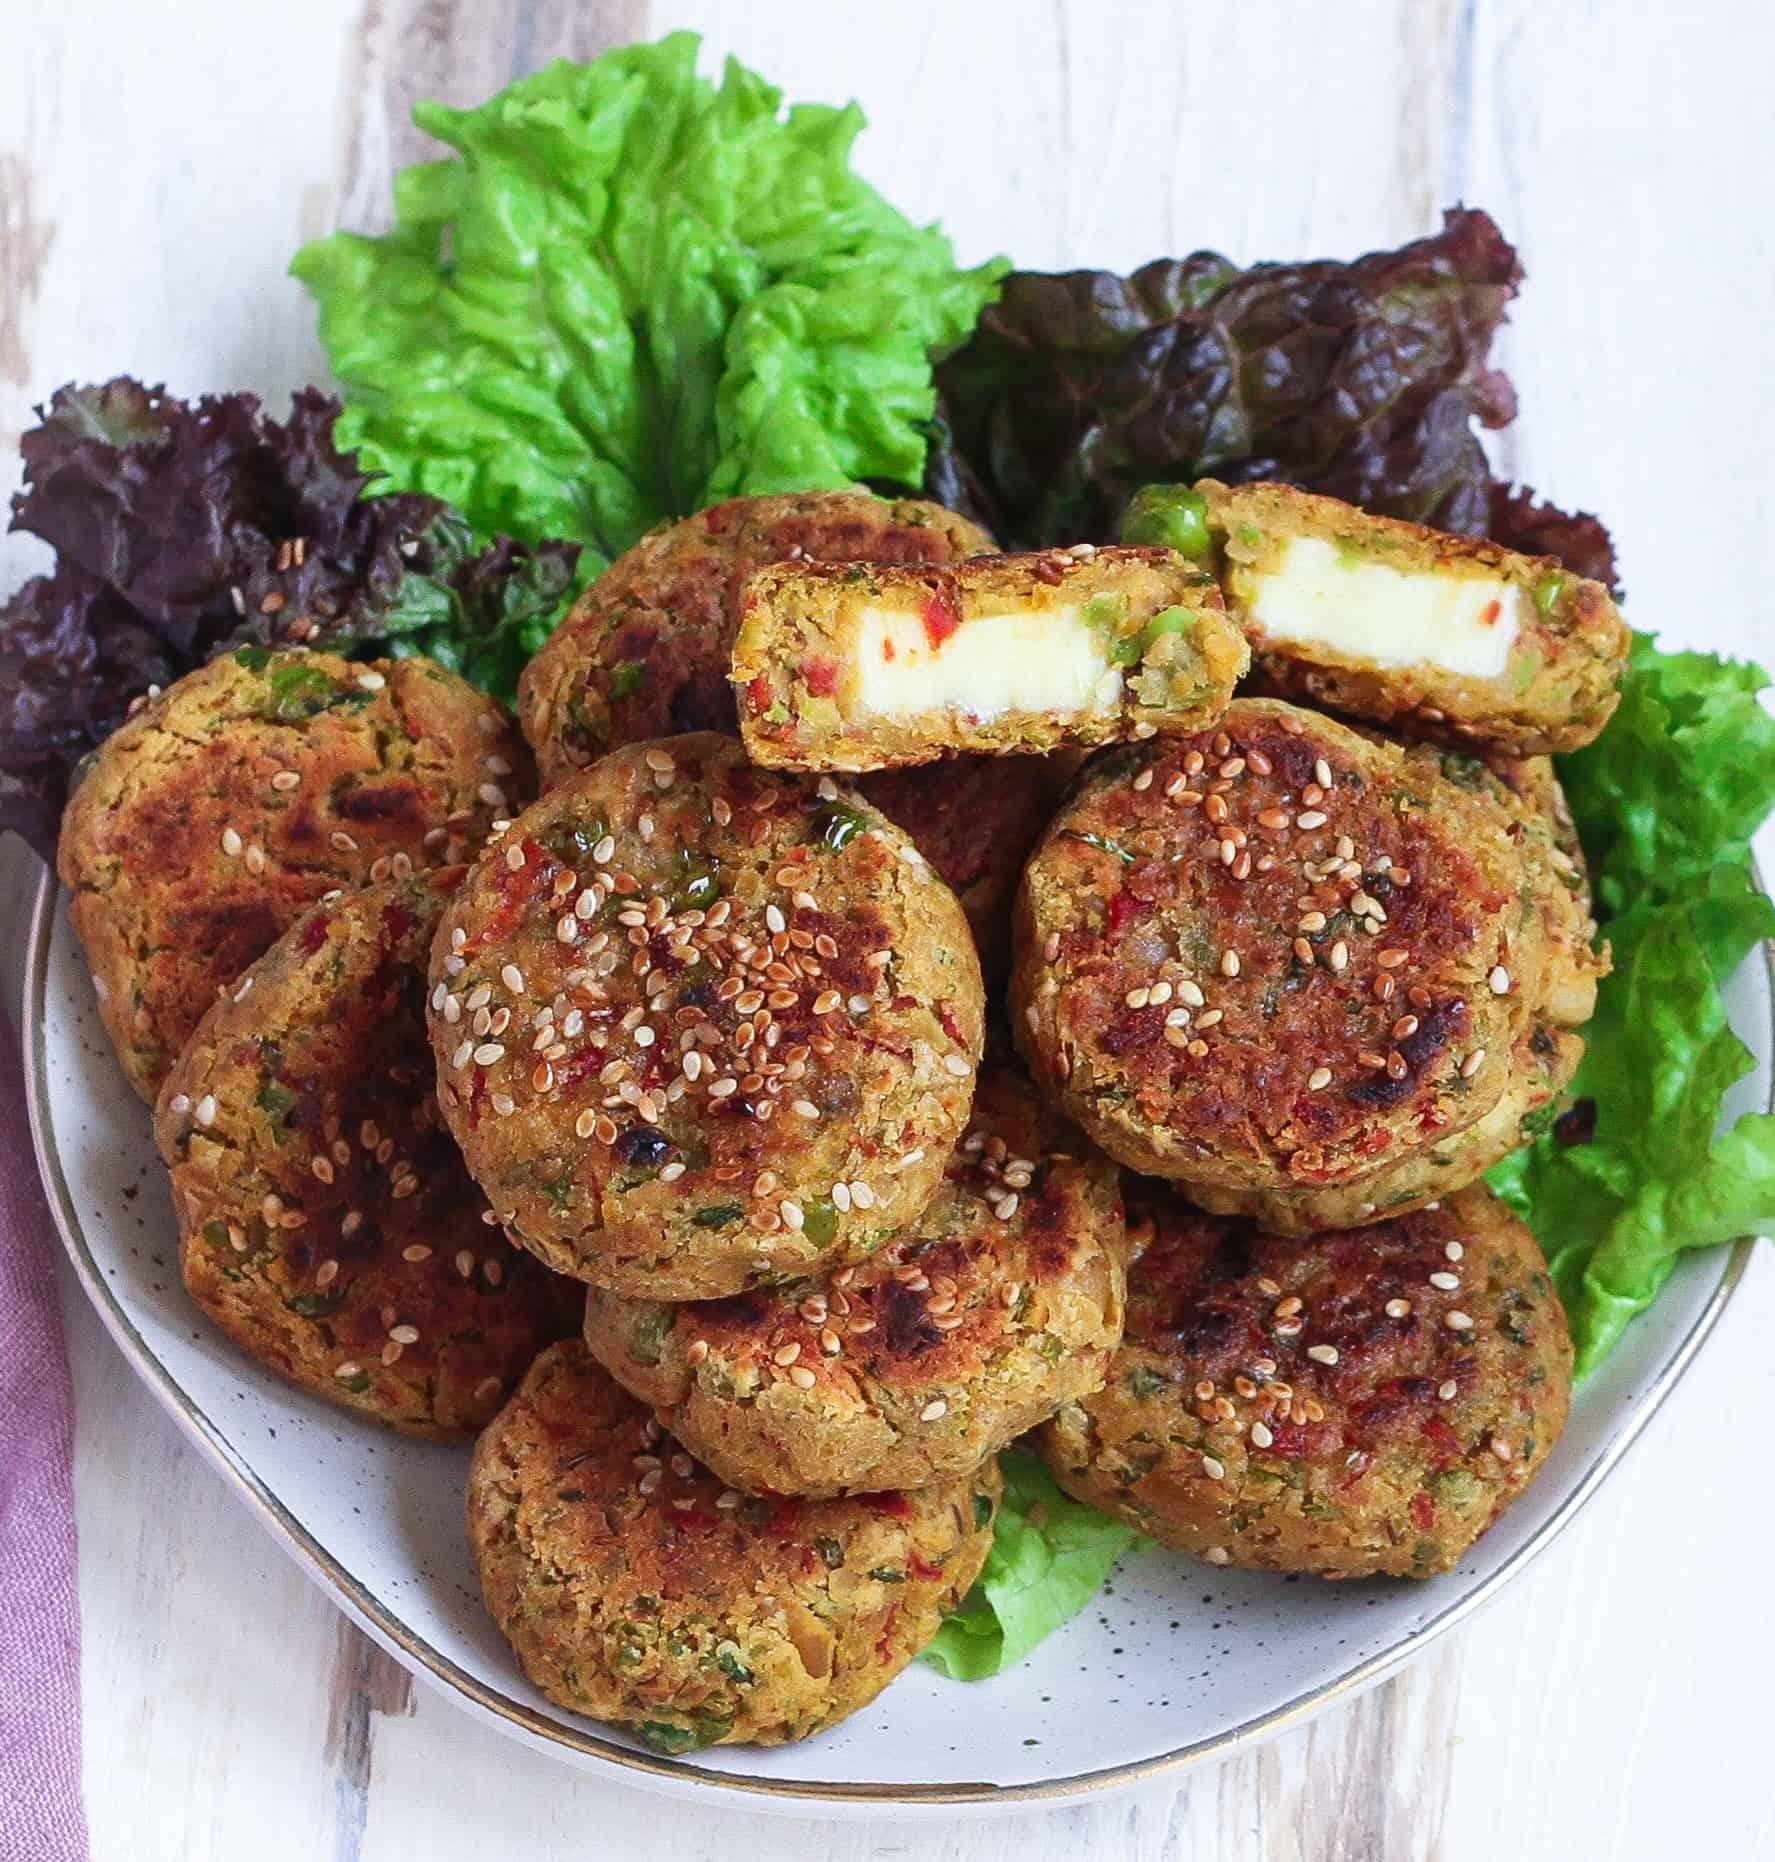 Vegetable Cheese Falafels vegetarian, healthy, easy recipe, glutenfree recipe